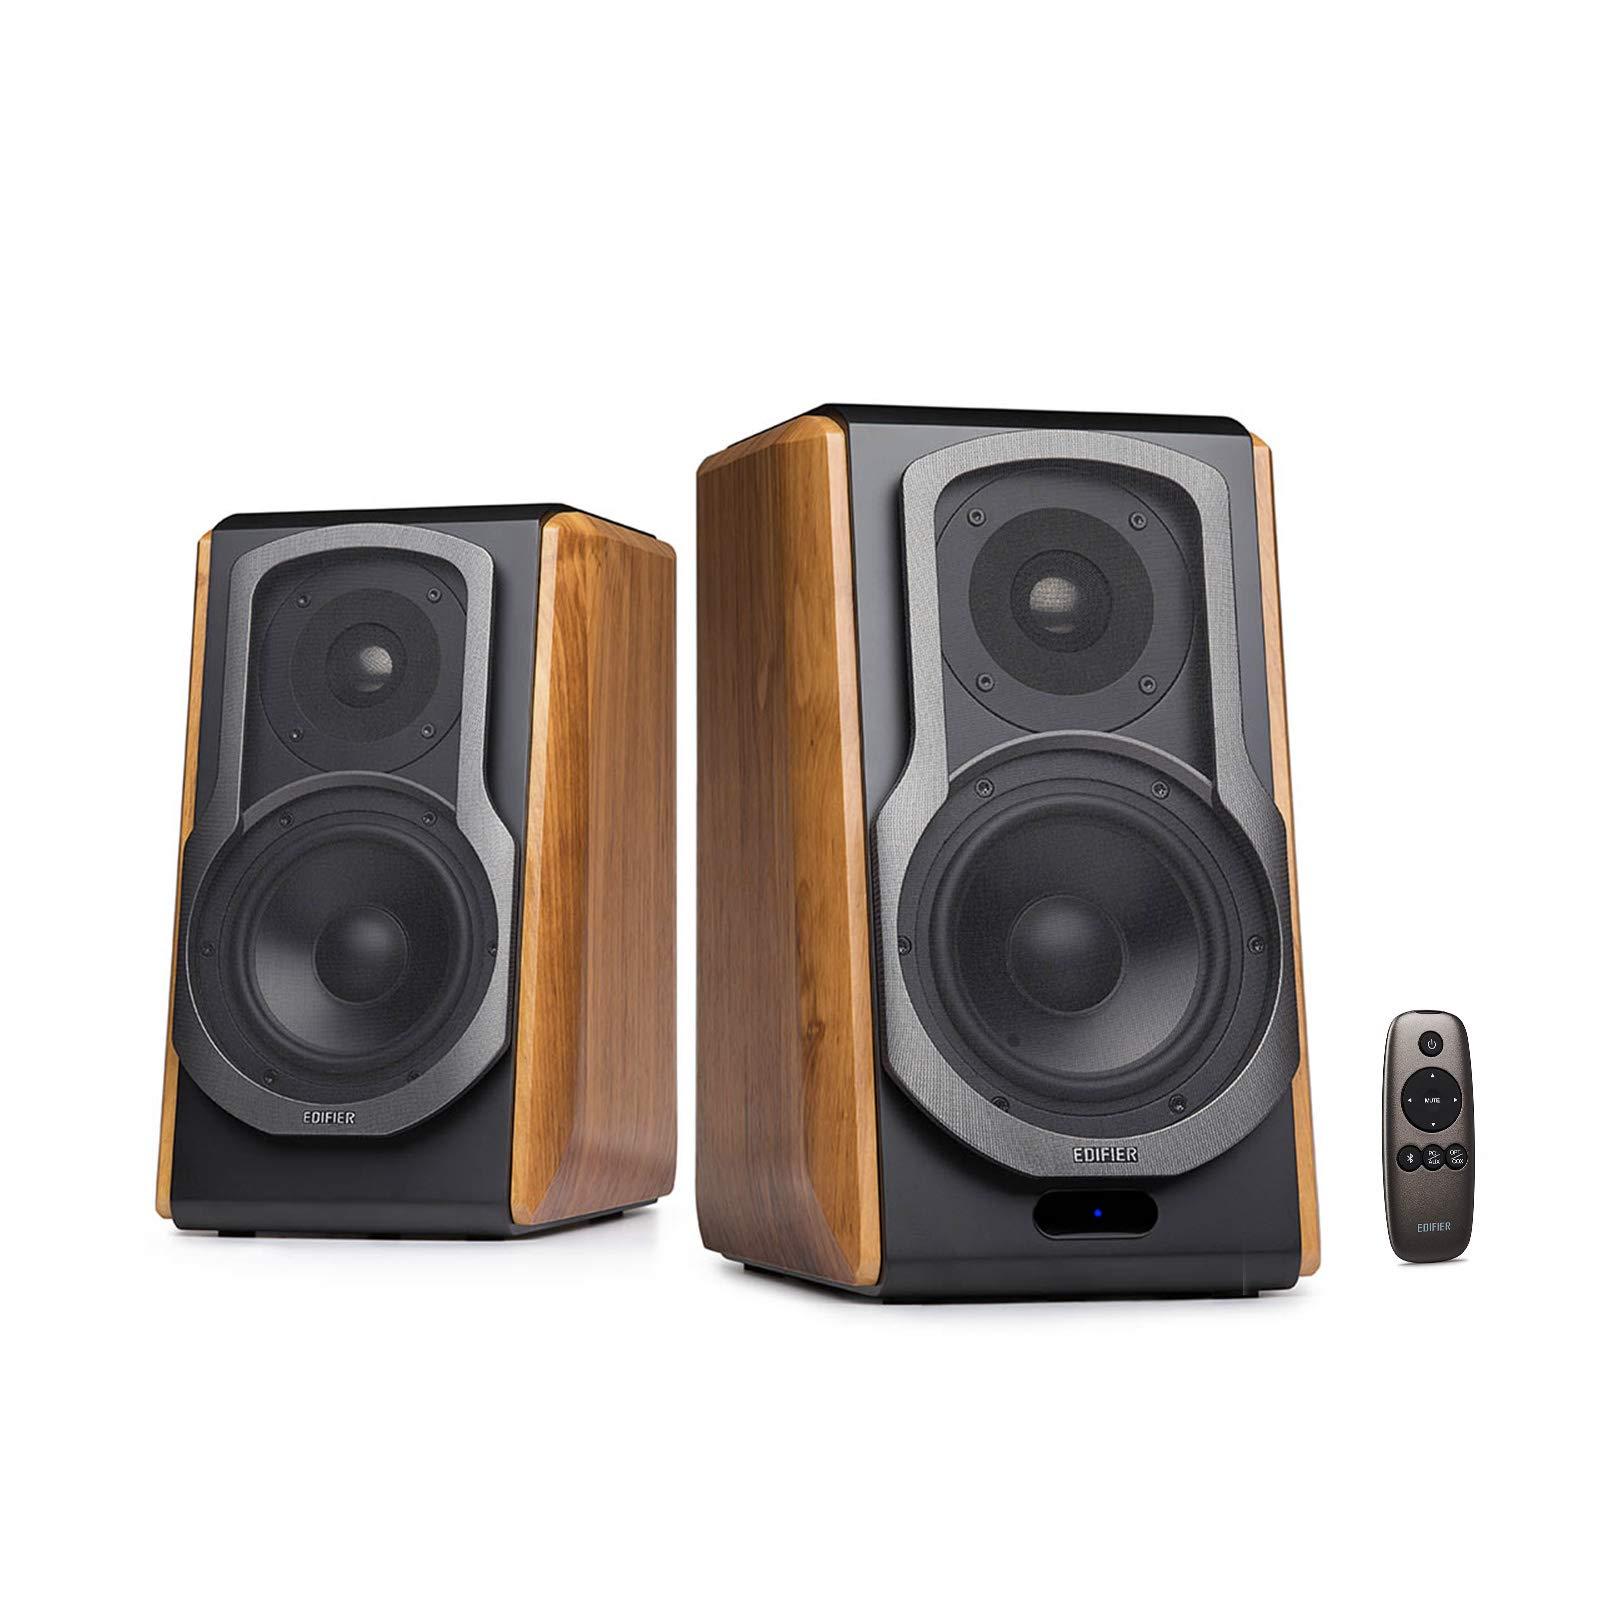 Edifier S1000DB Audiophile Bookshelf Speakers